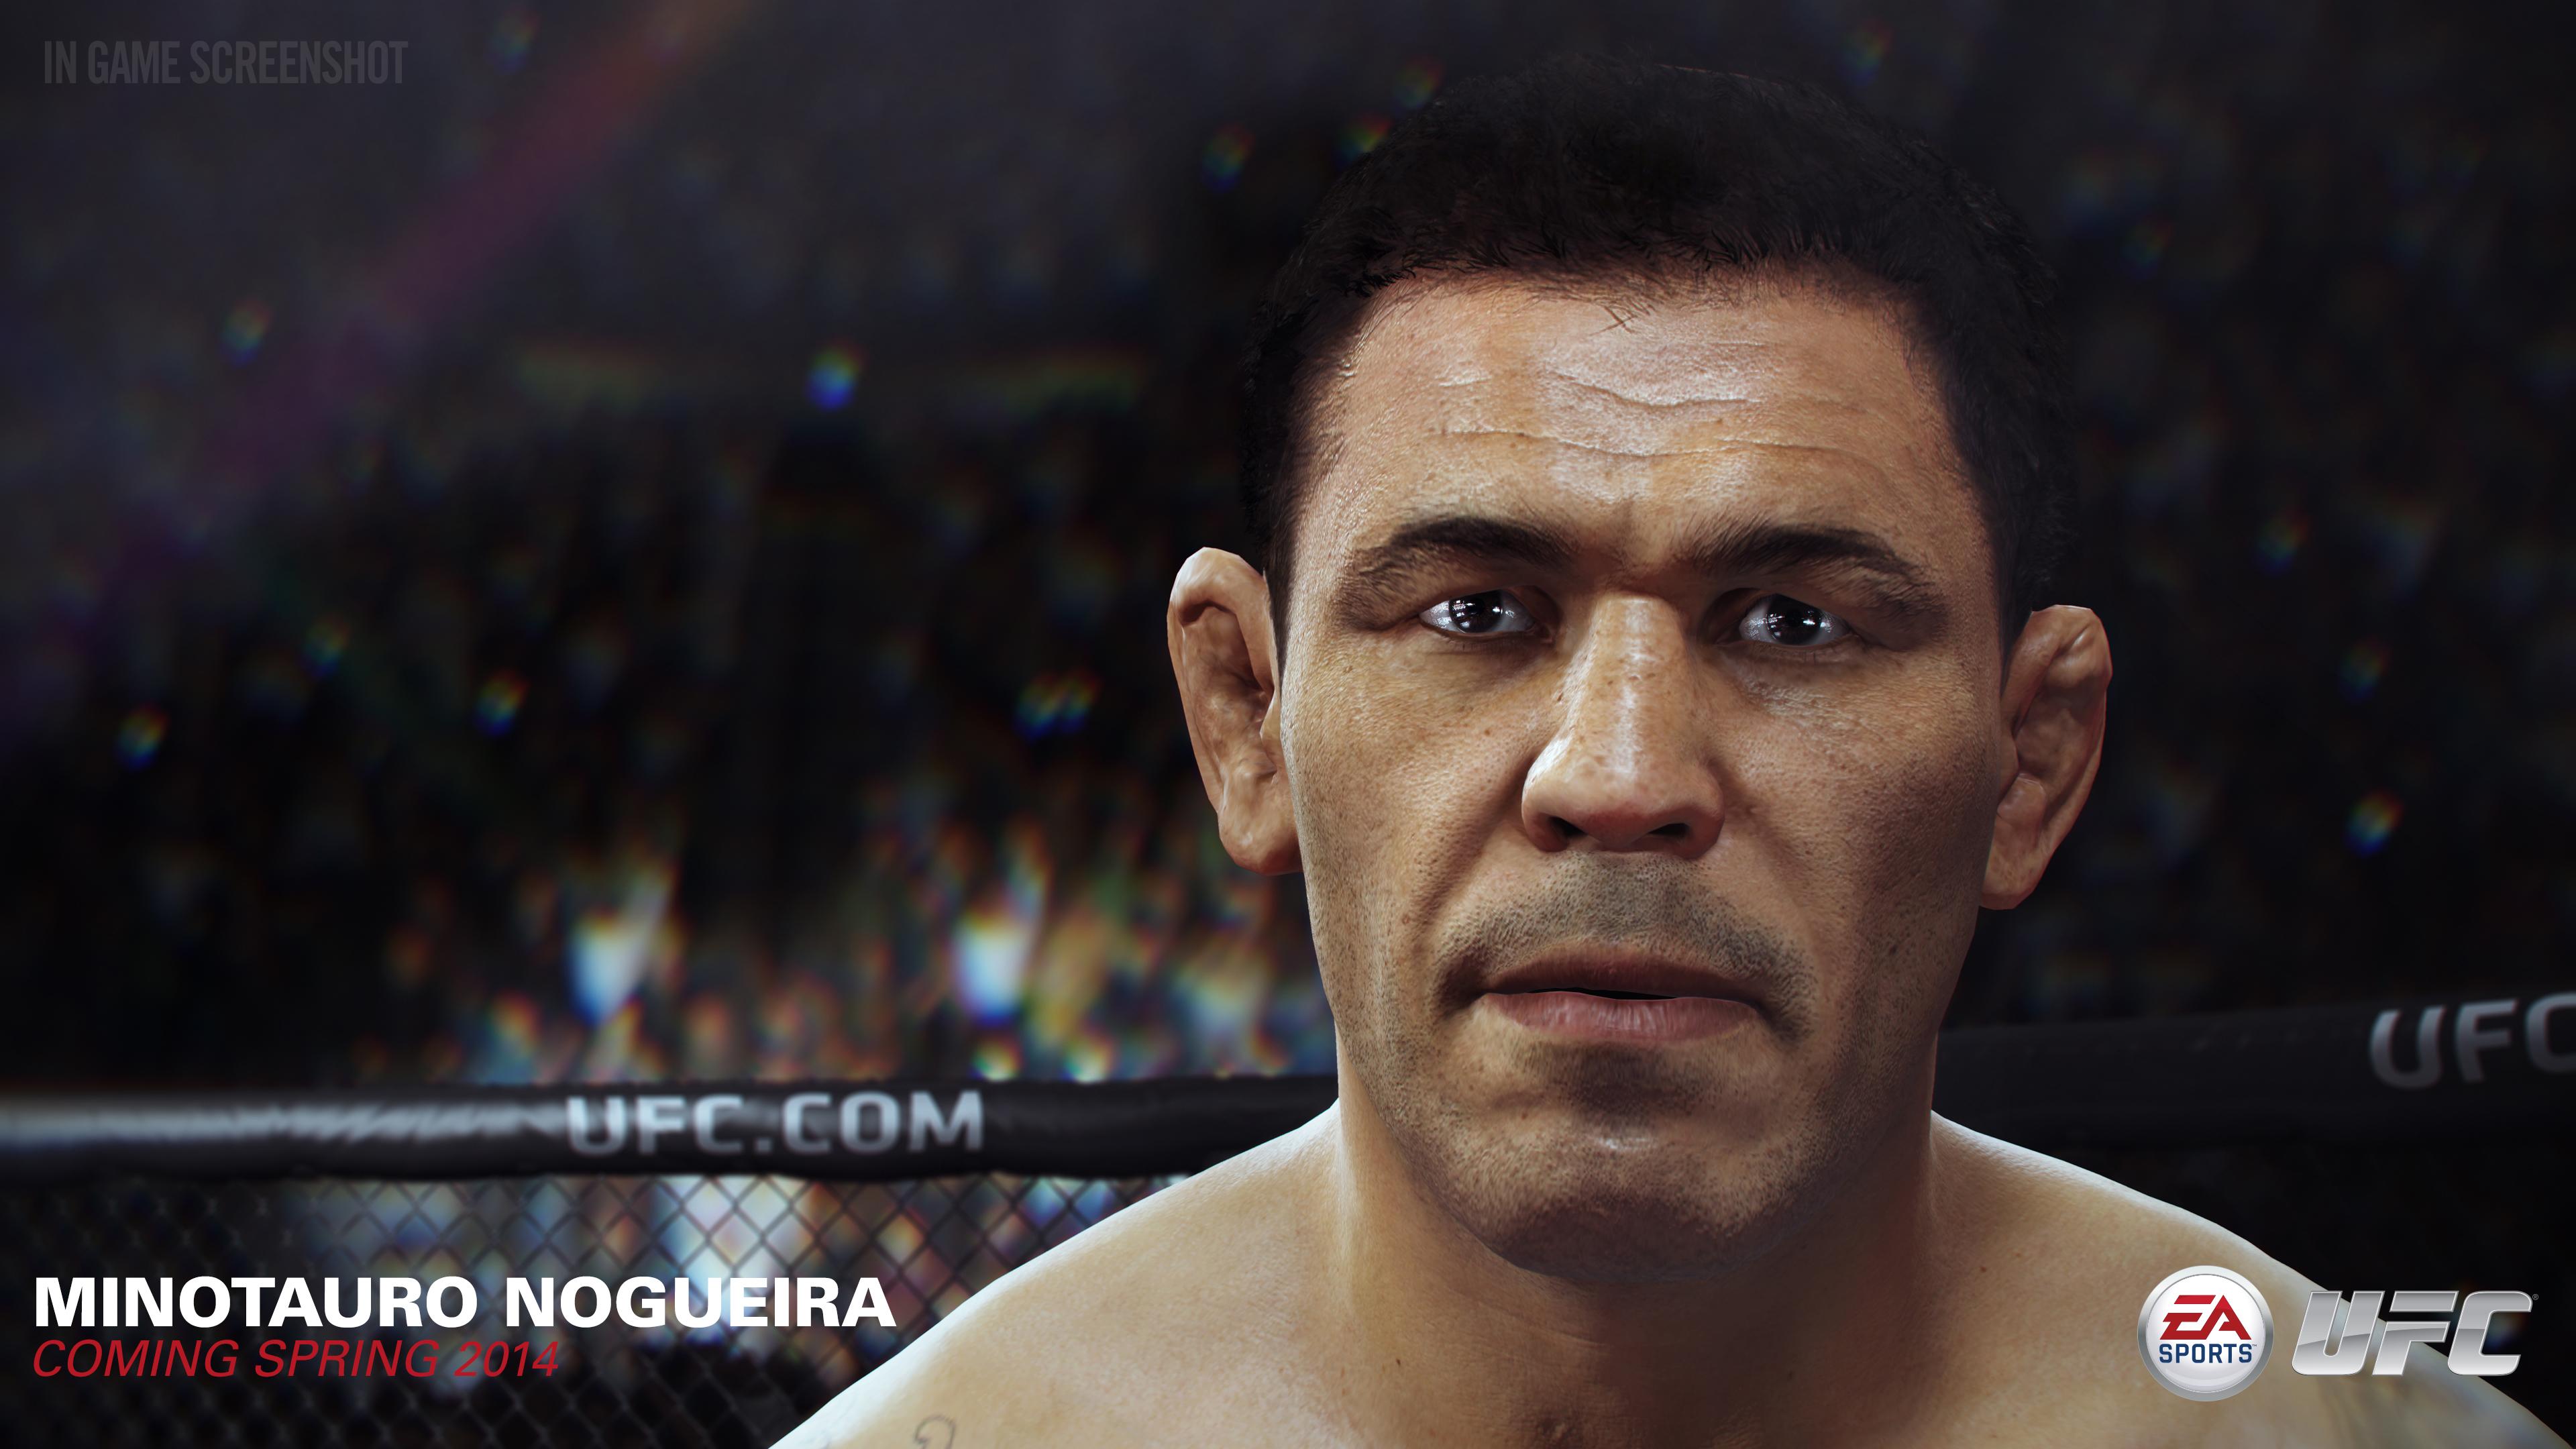 Антонио Родриго Ногейра - EA Sports UFC 4K